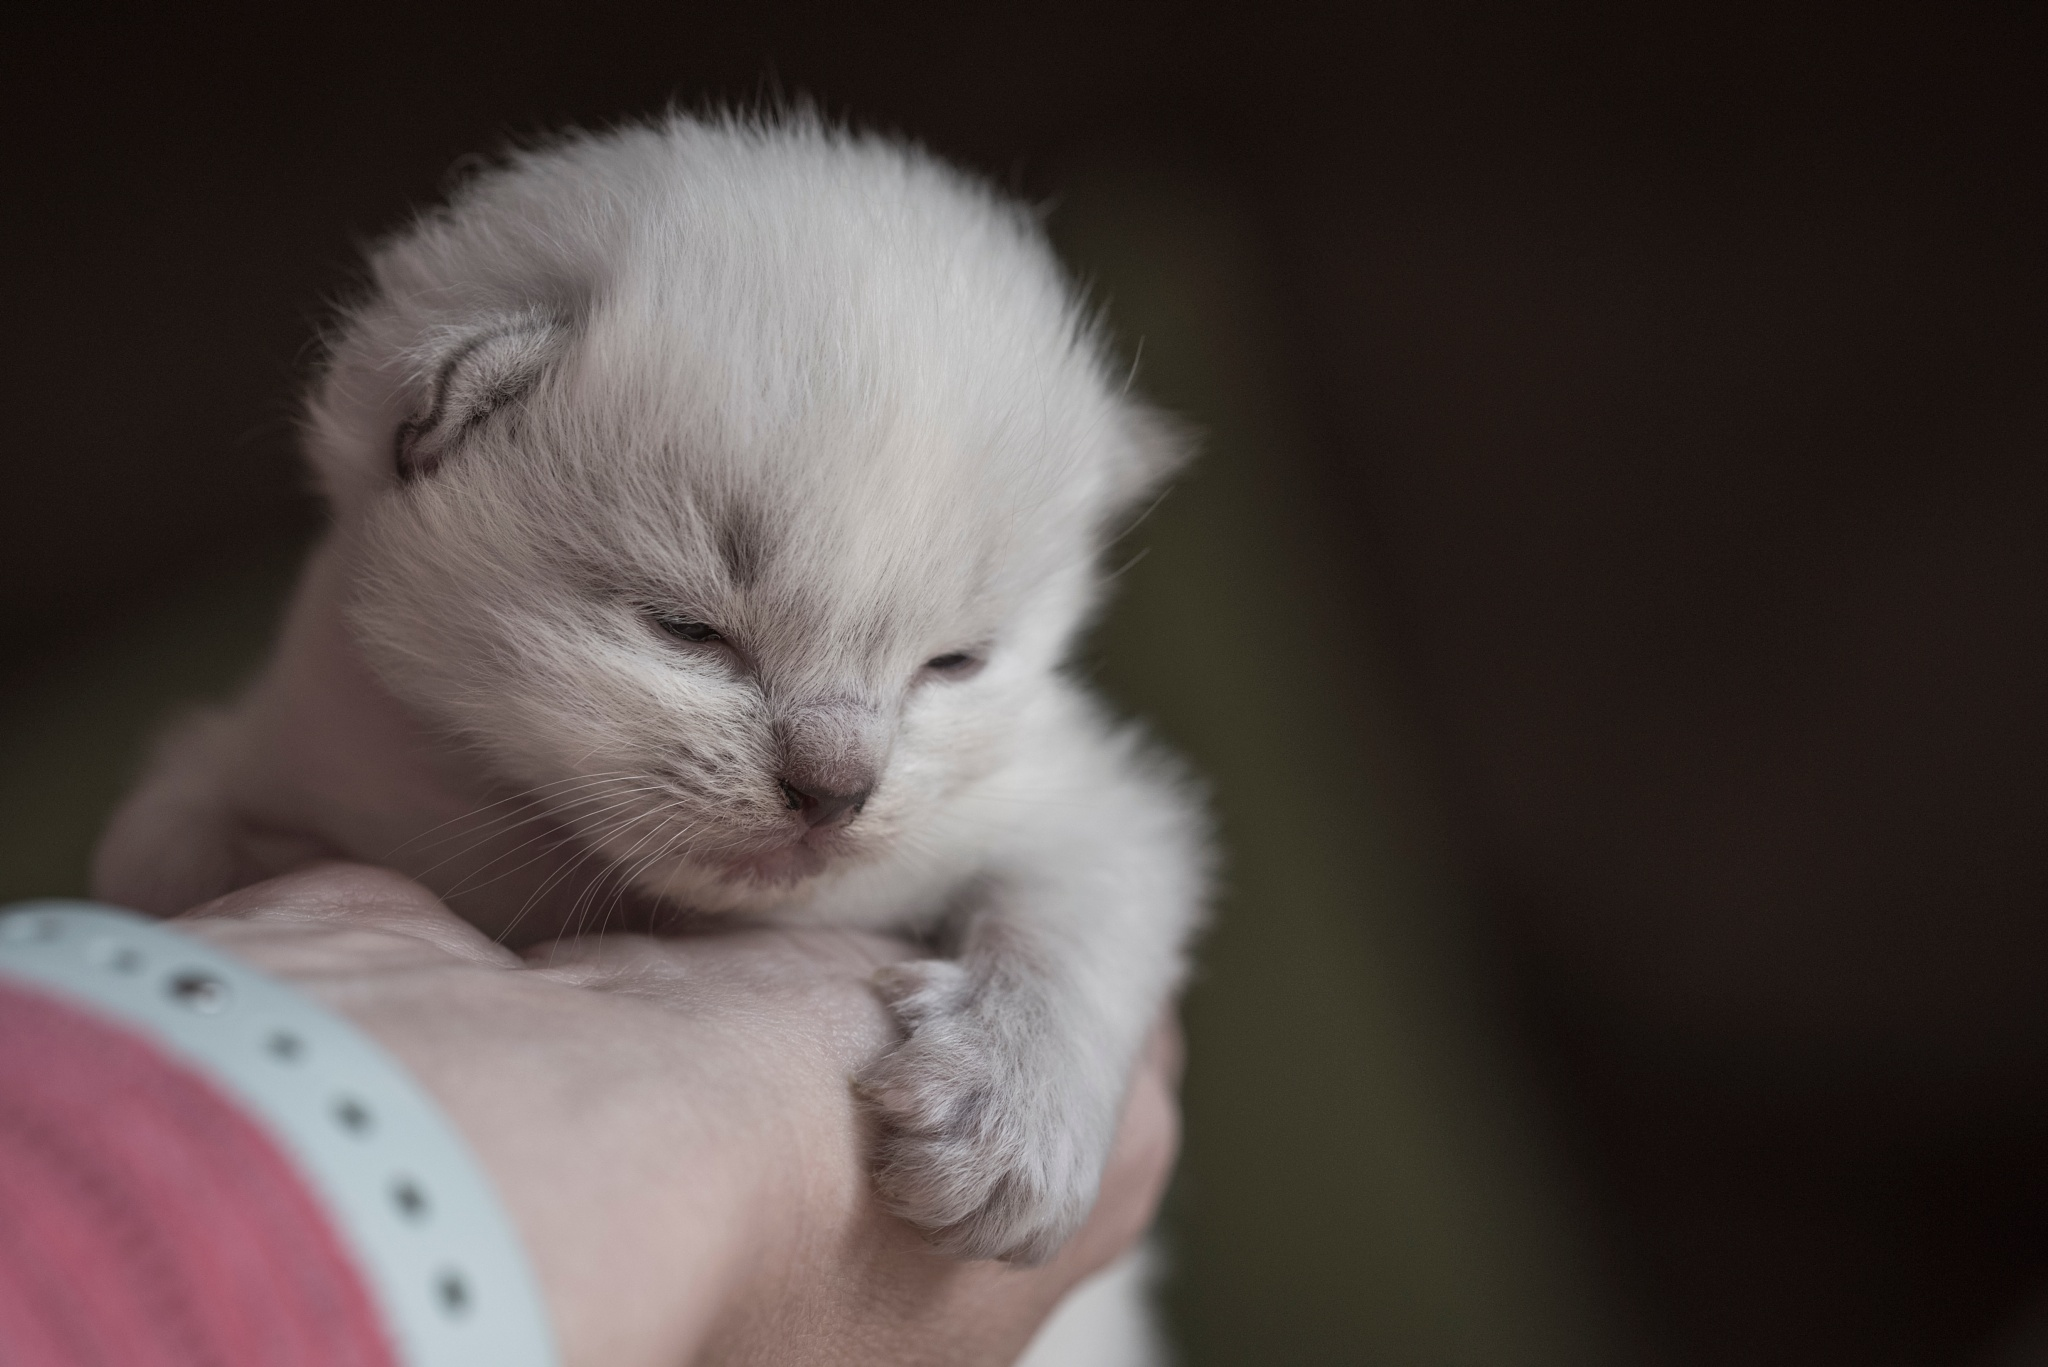 Cutie by LouiseKaye